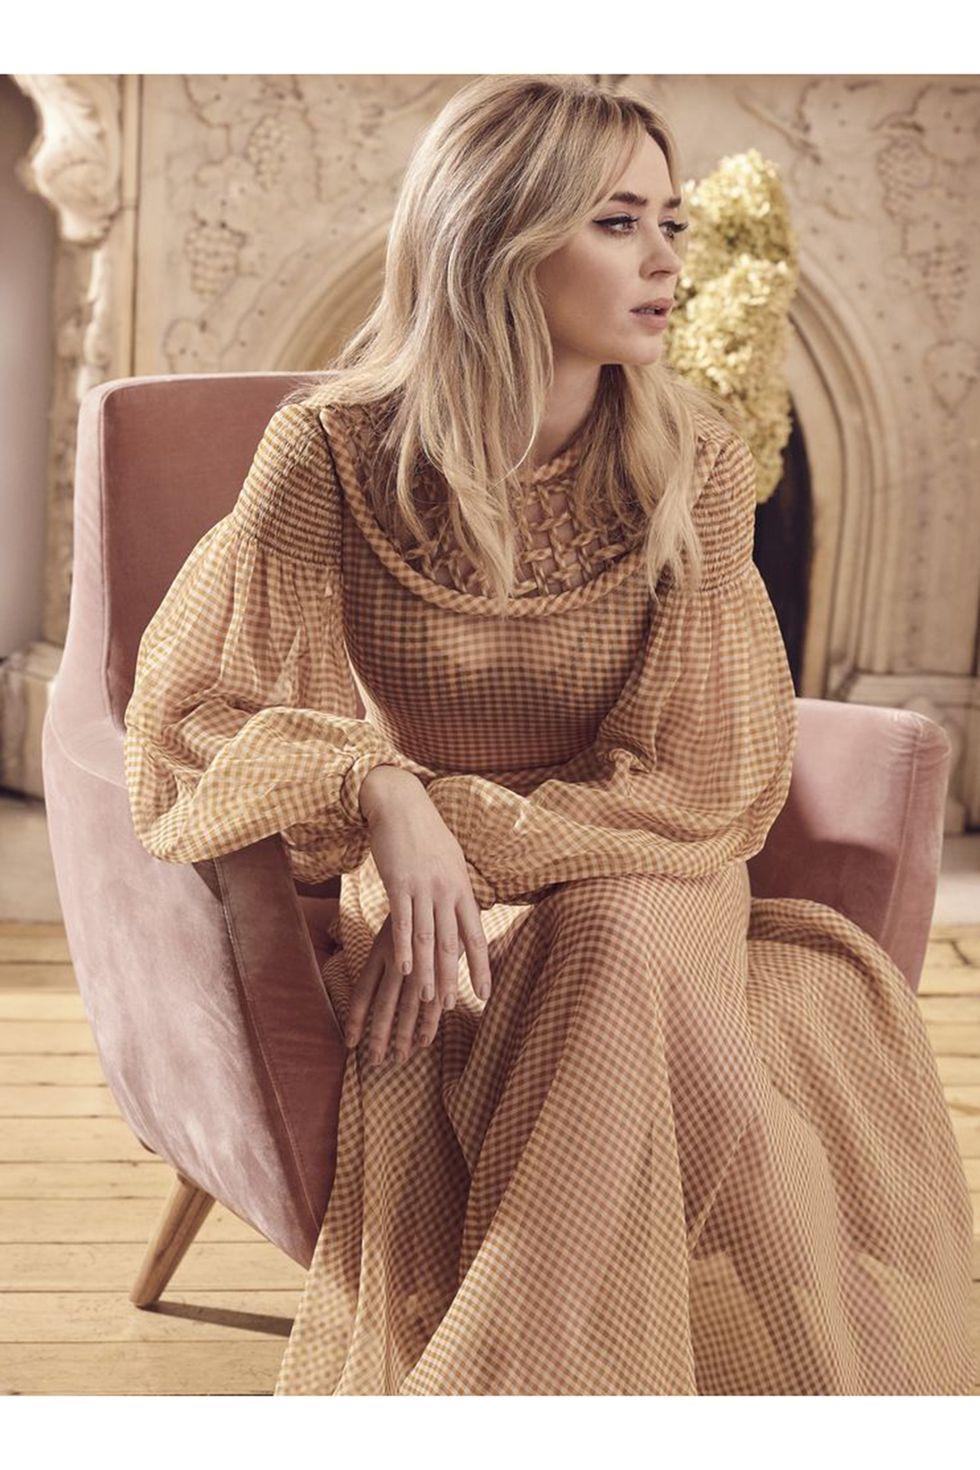 Emily Blunt brings semi-sheer glam in a Fendi dress